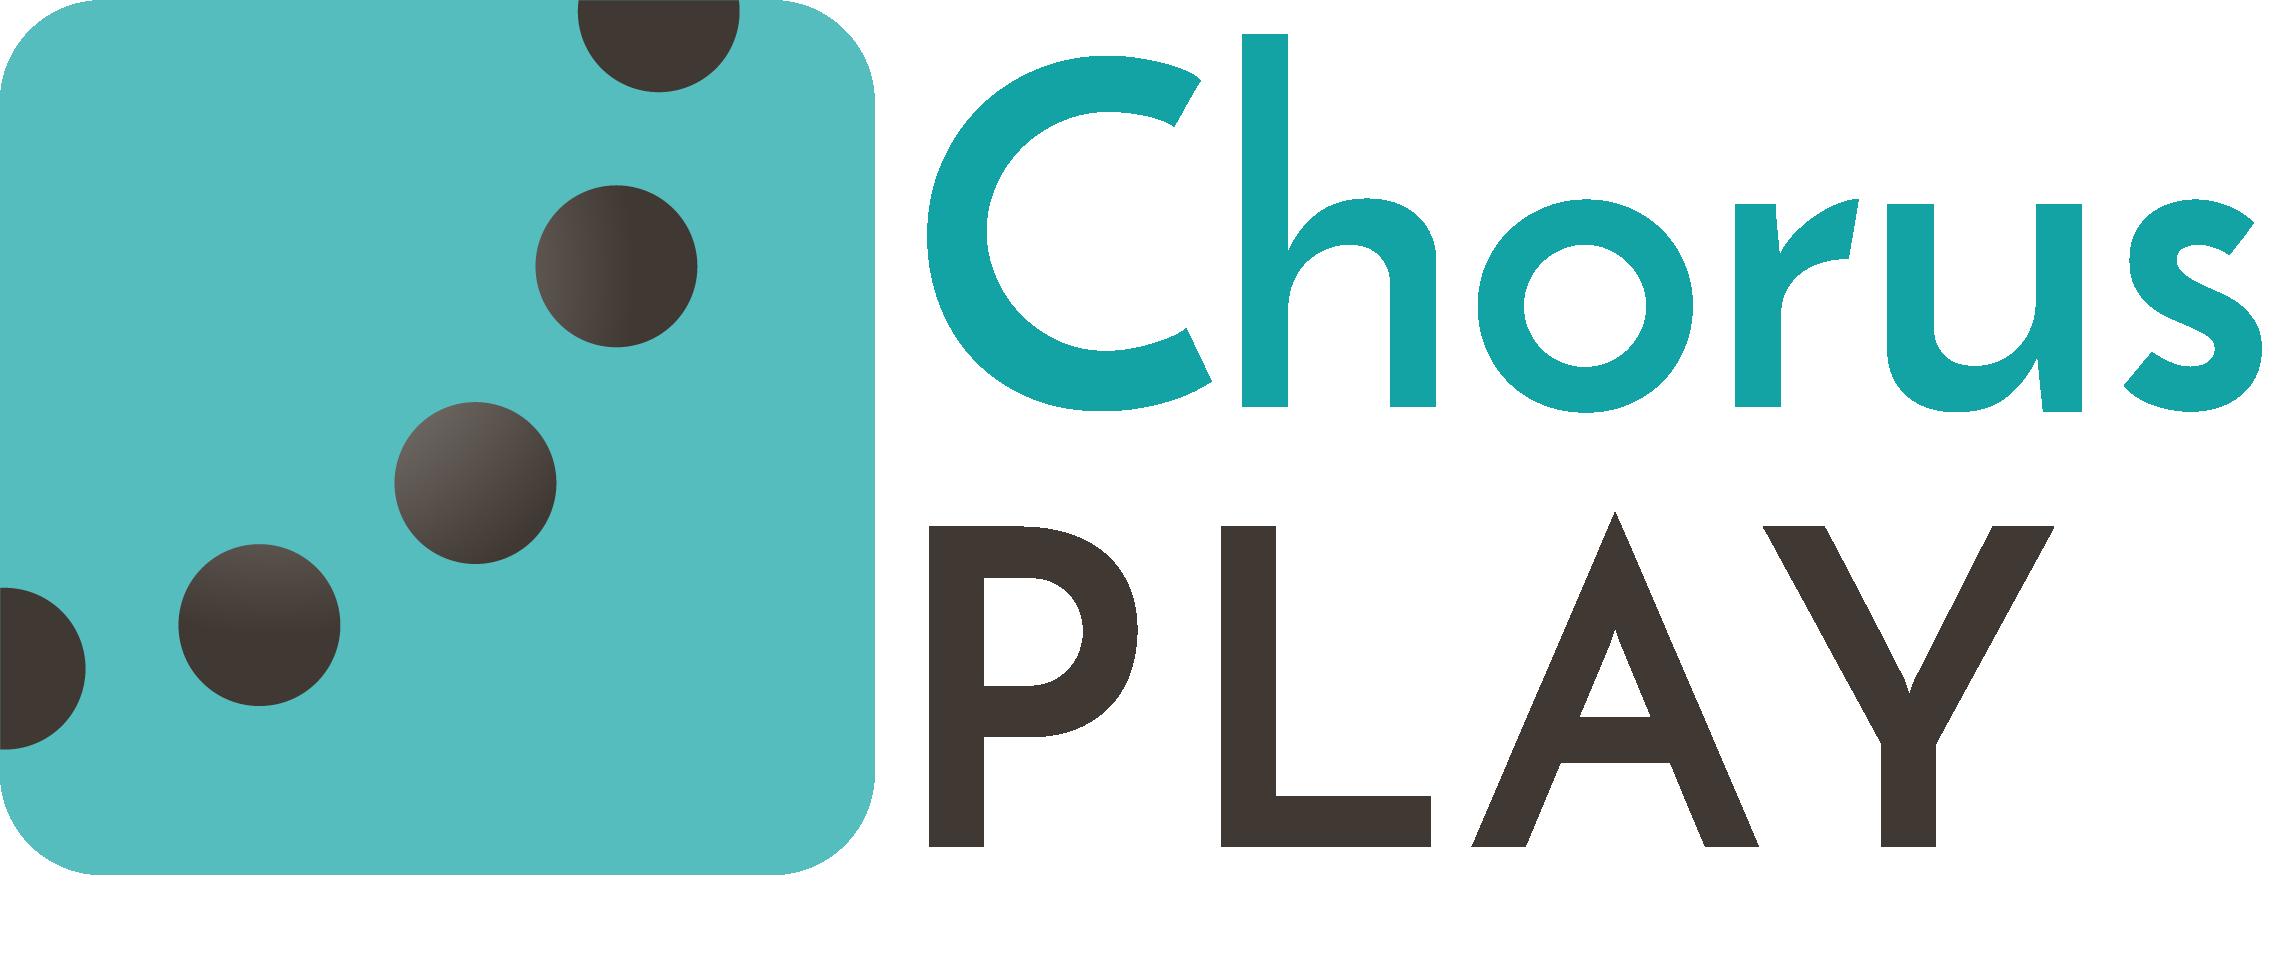 ChorusPlay recherche Tenor pour enregistrements chant choral